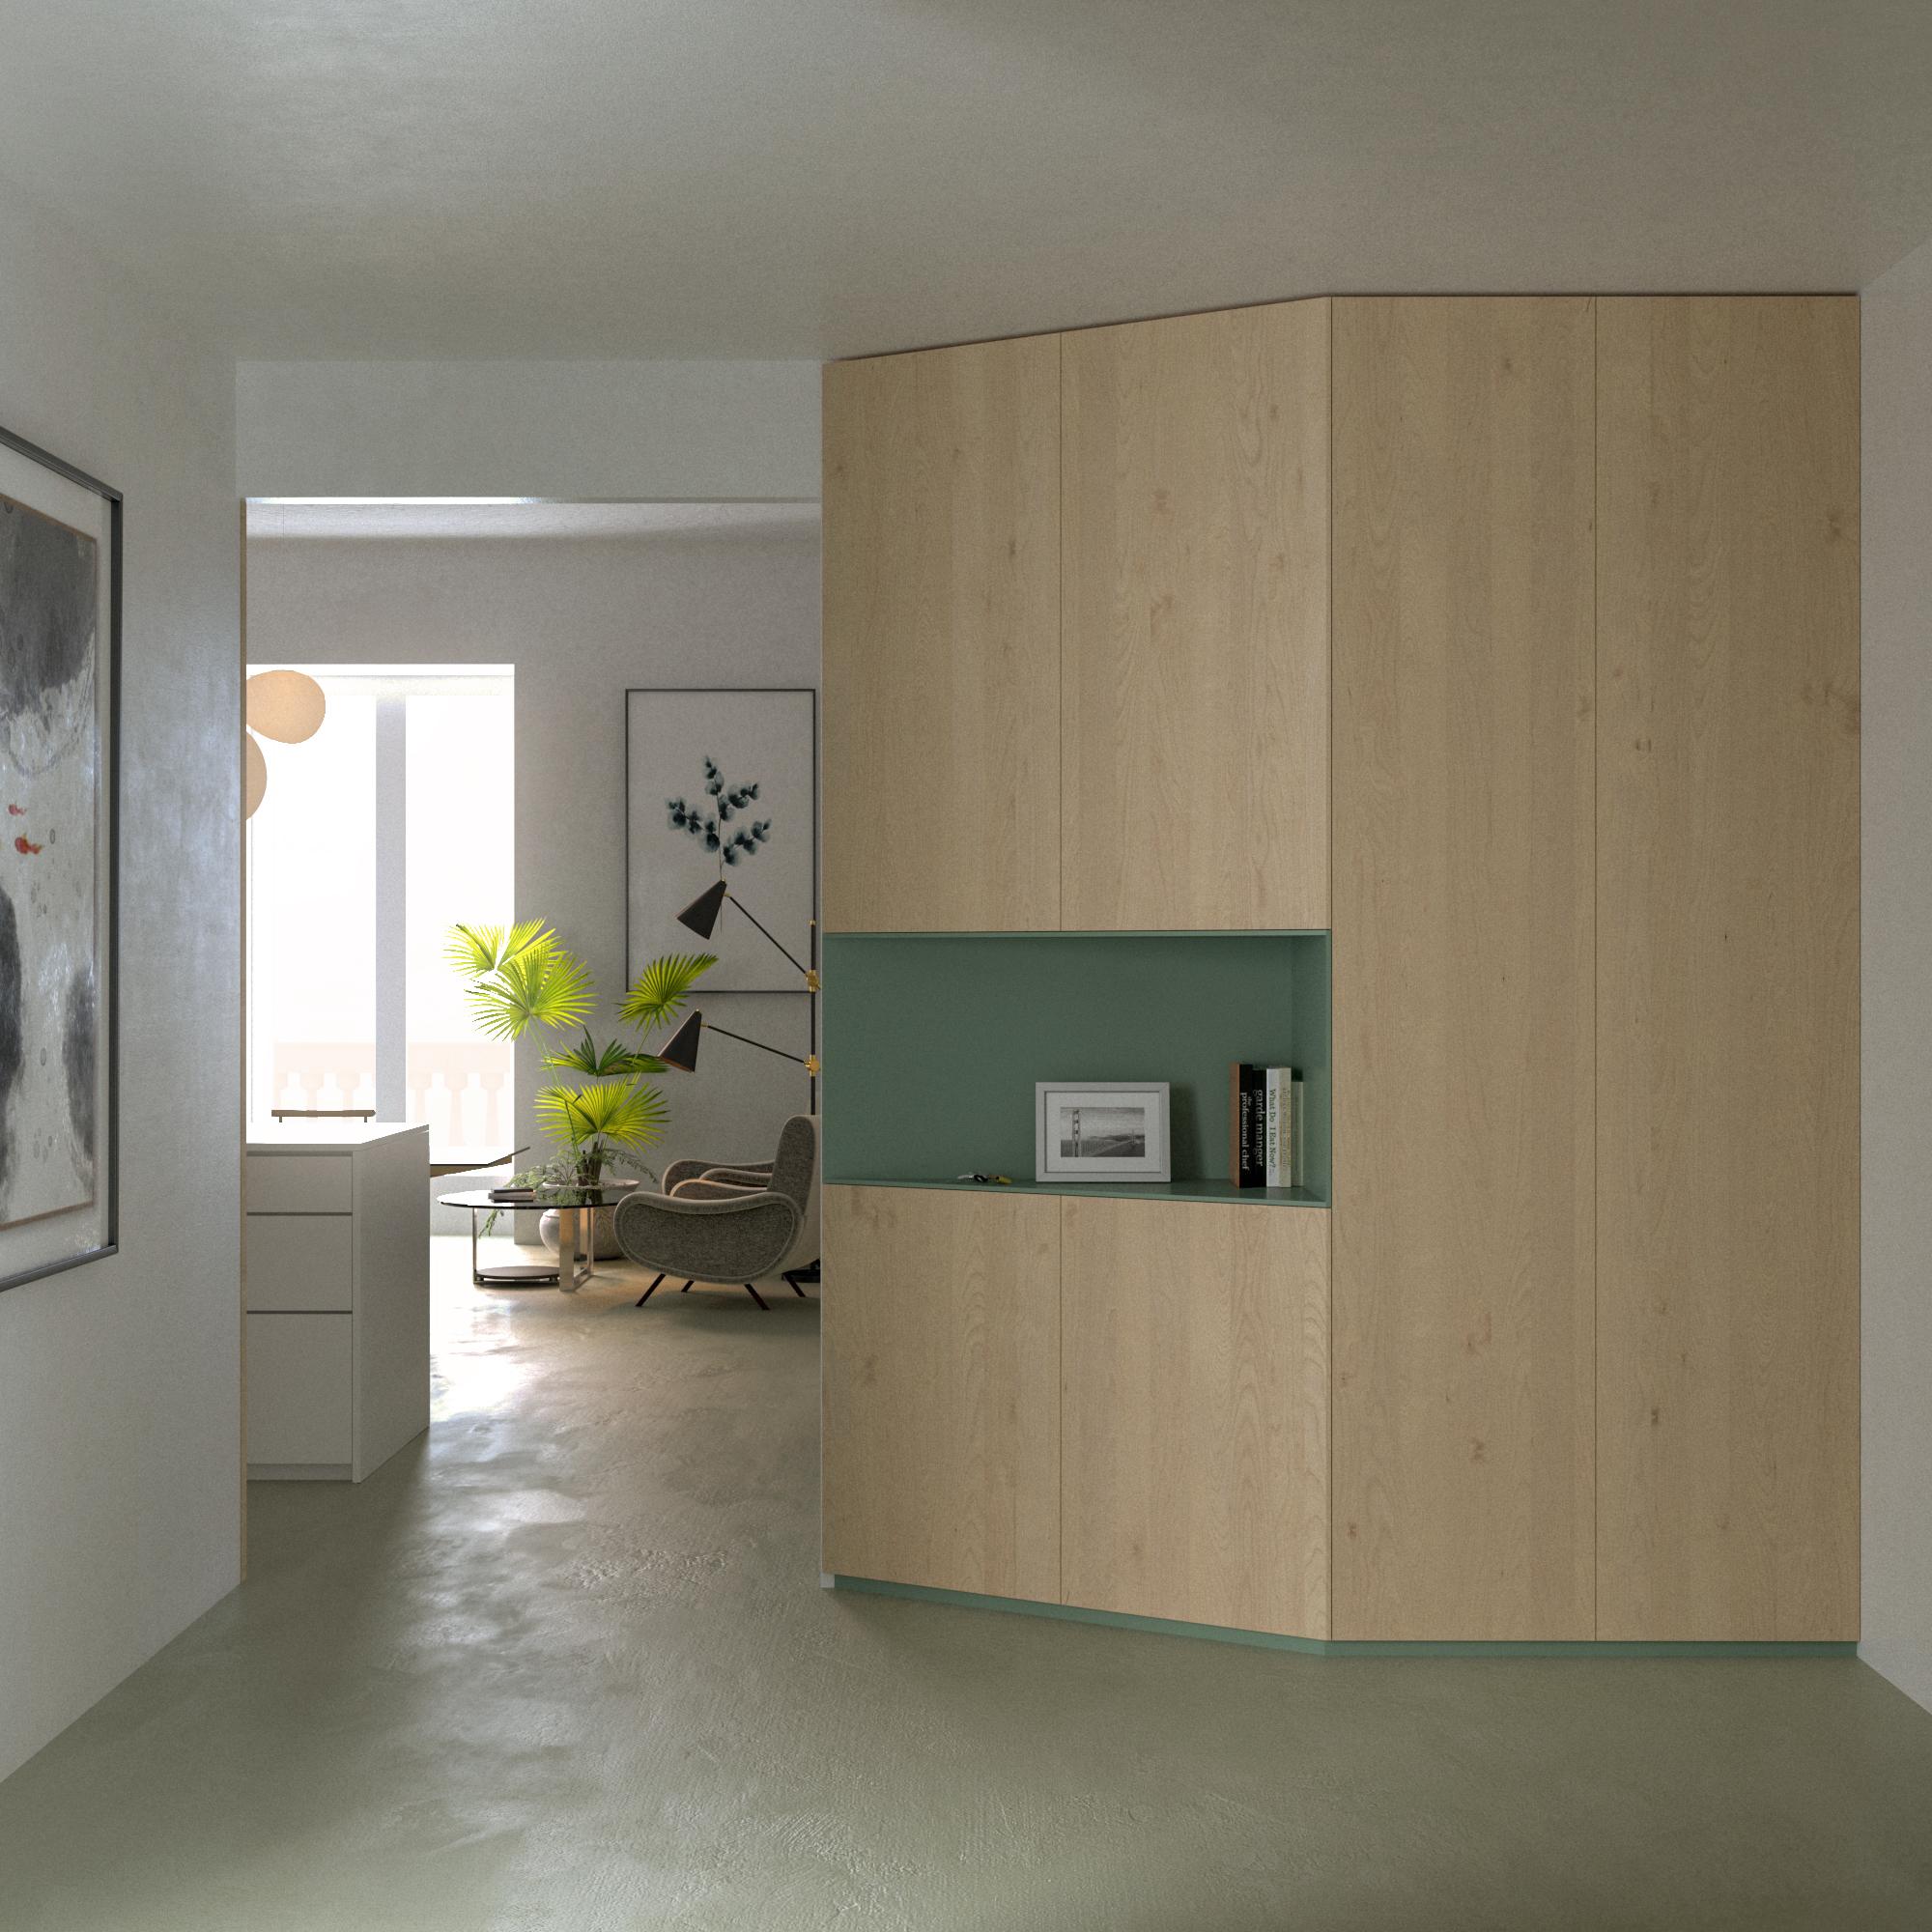 Appartamento in Largo Adua, Bari